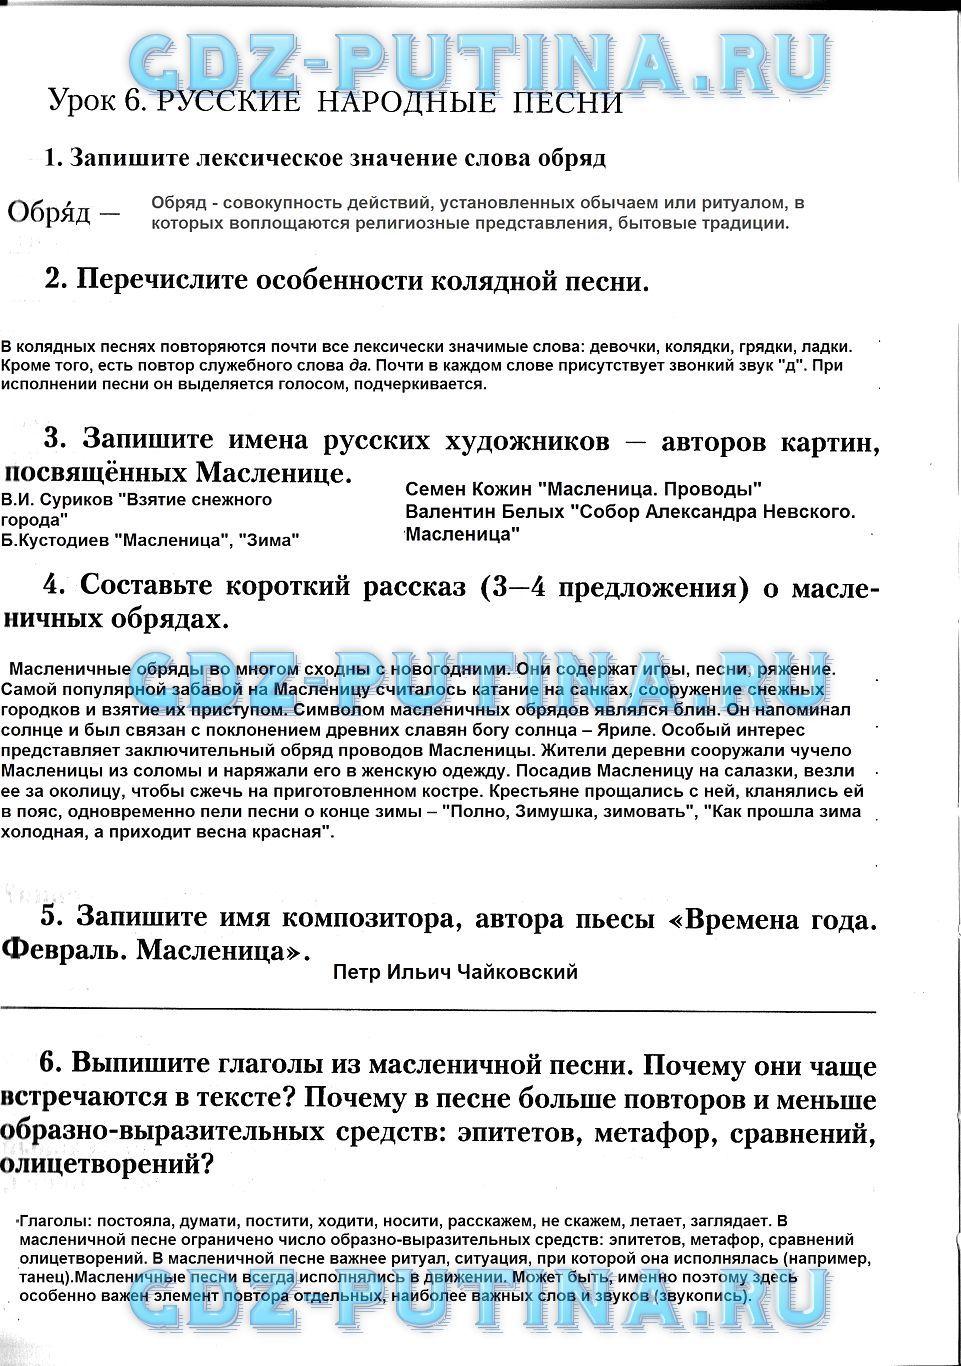 сборник задач по химии 7 класс хвалюк резяпкин